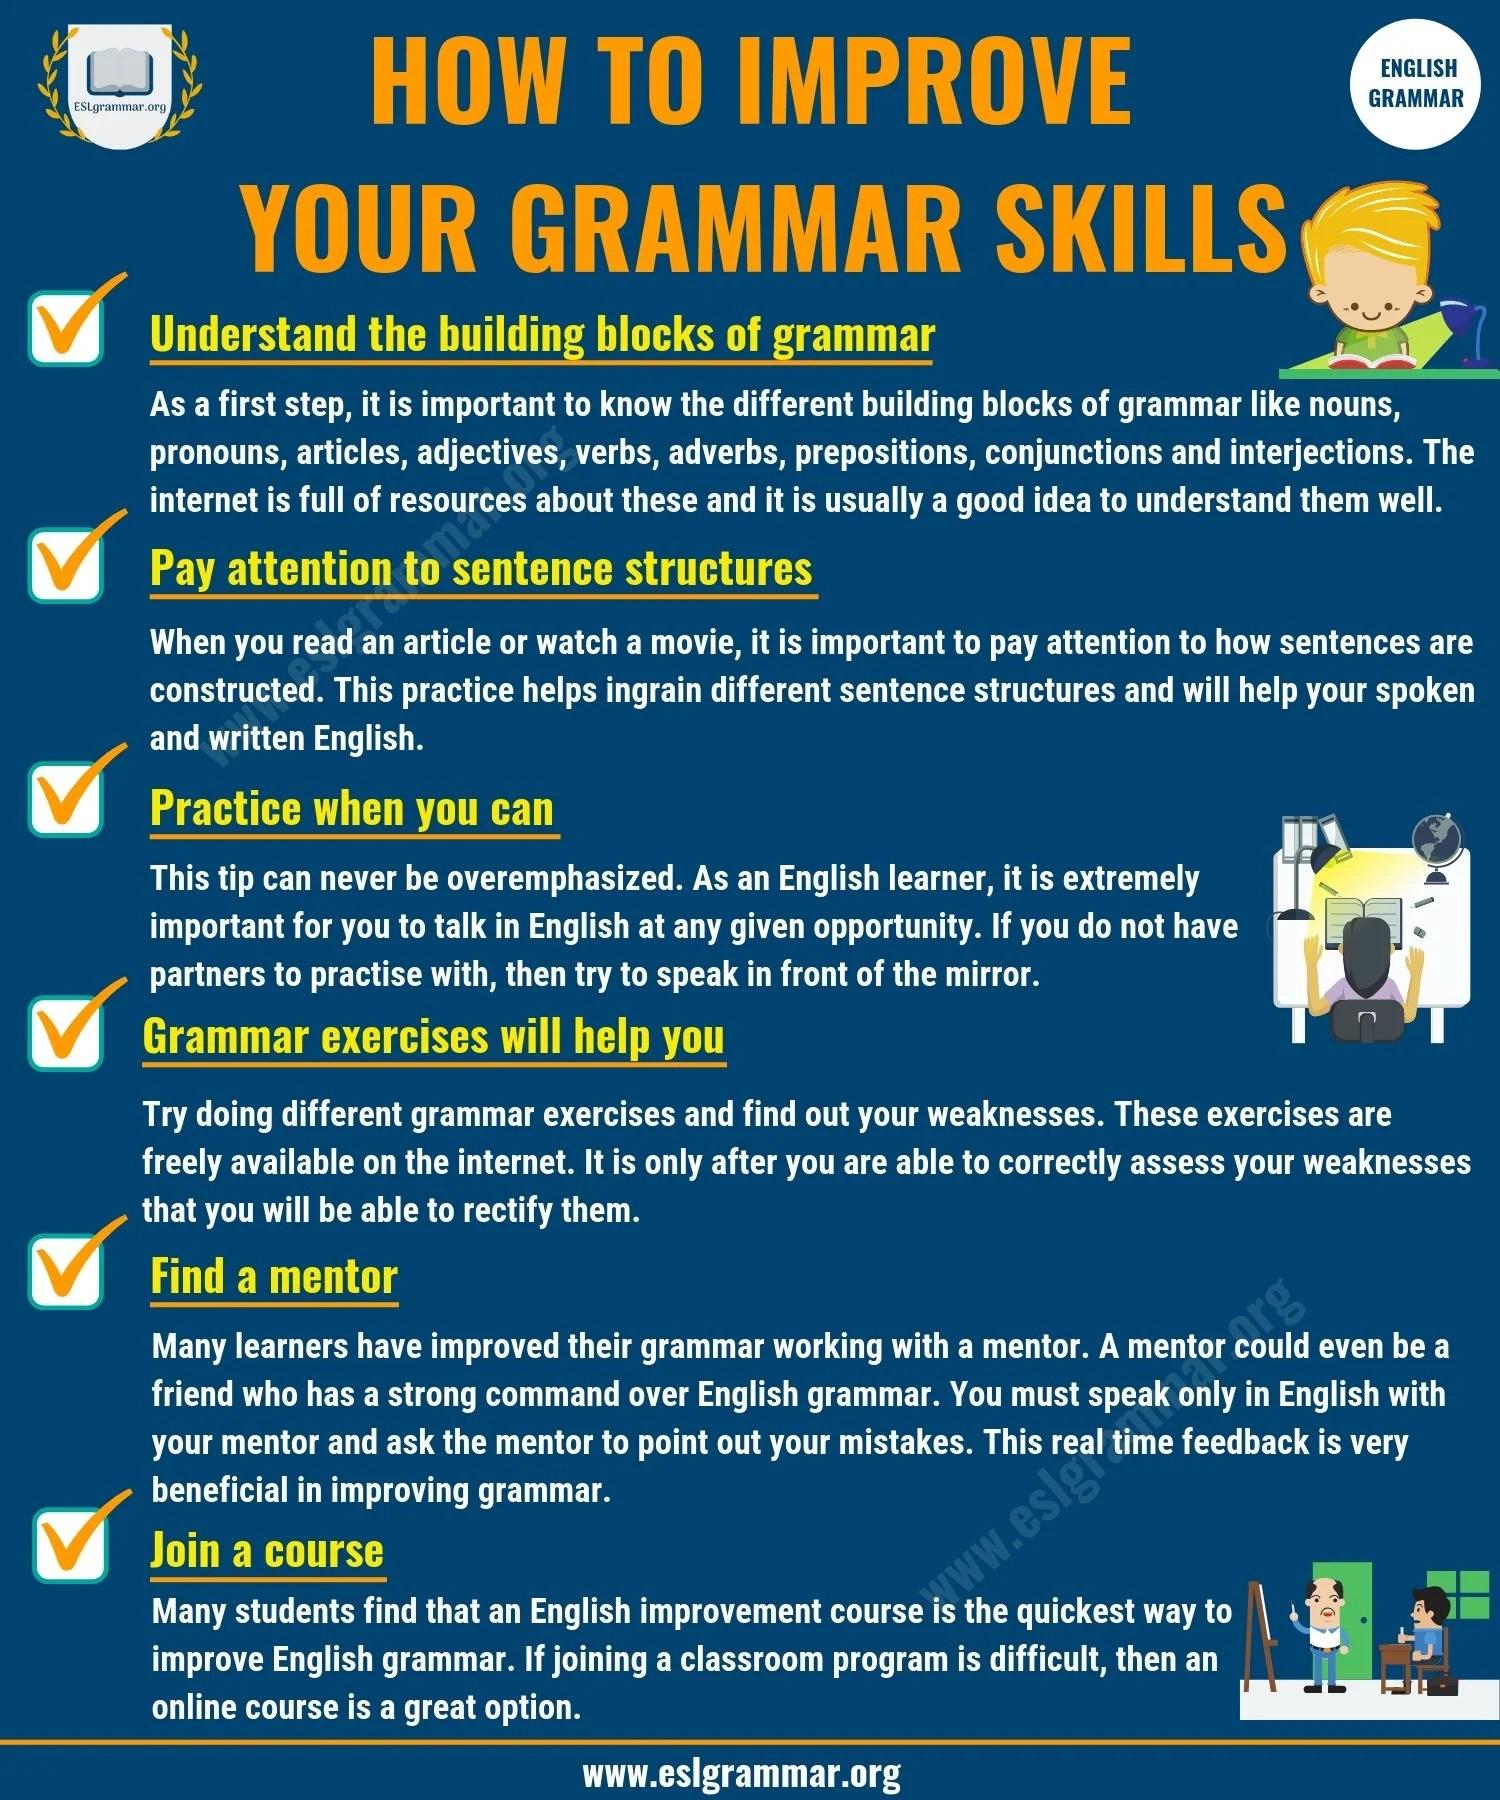 Hda An The English Grammar